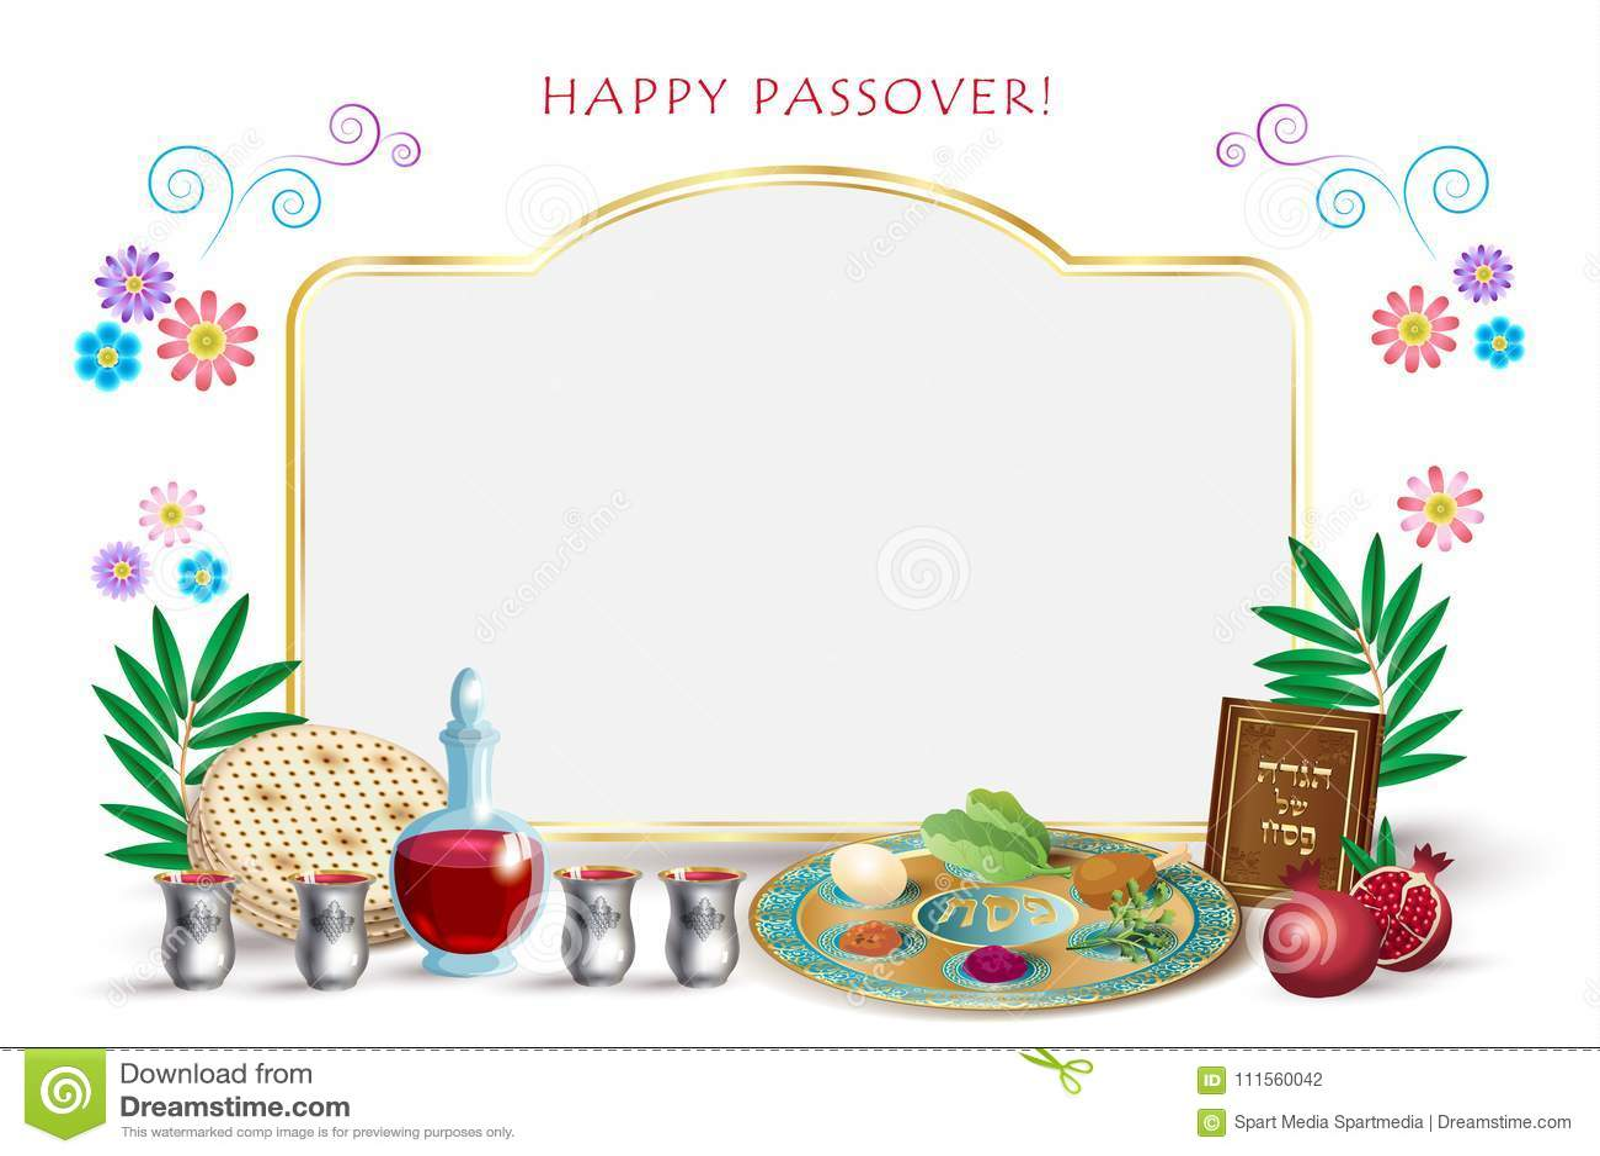 Passover Jewish Holiday Pesach Seder Symbols Stock Vector